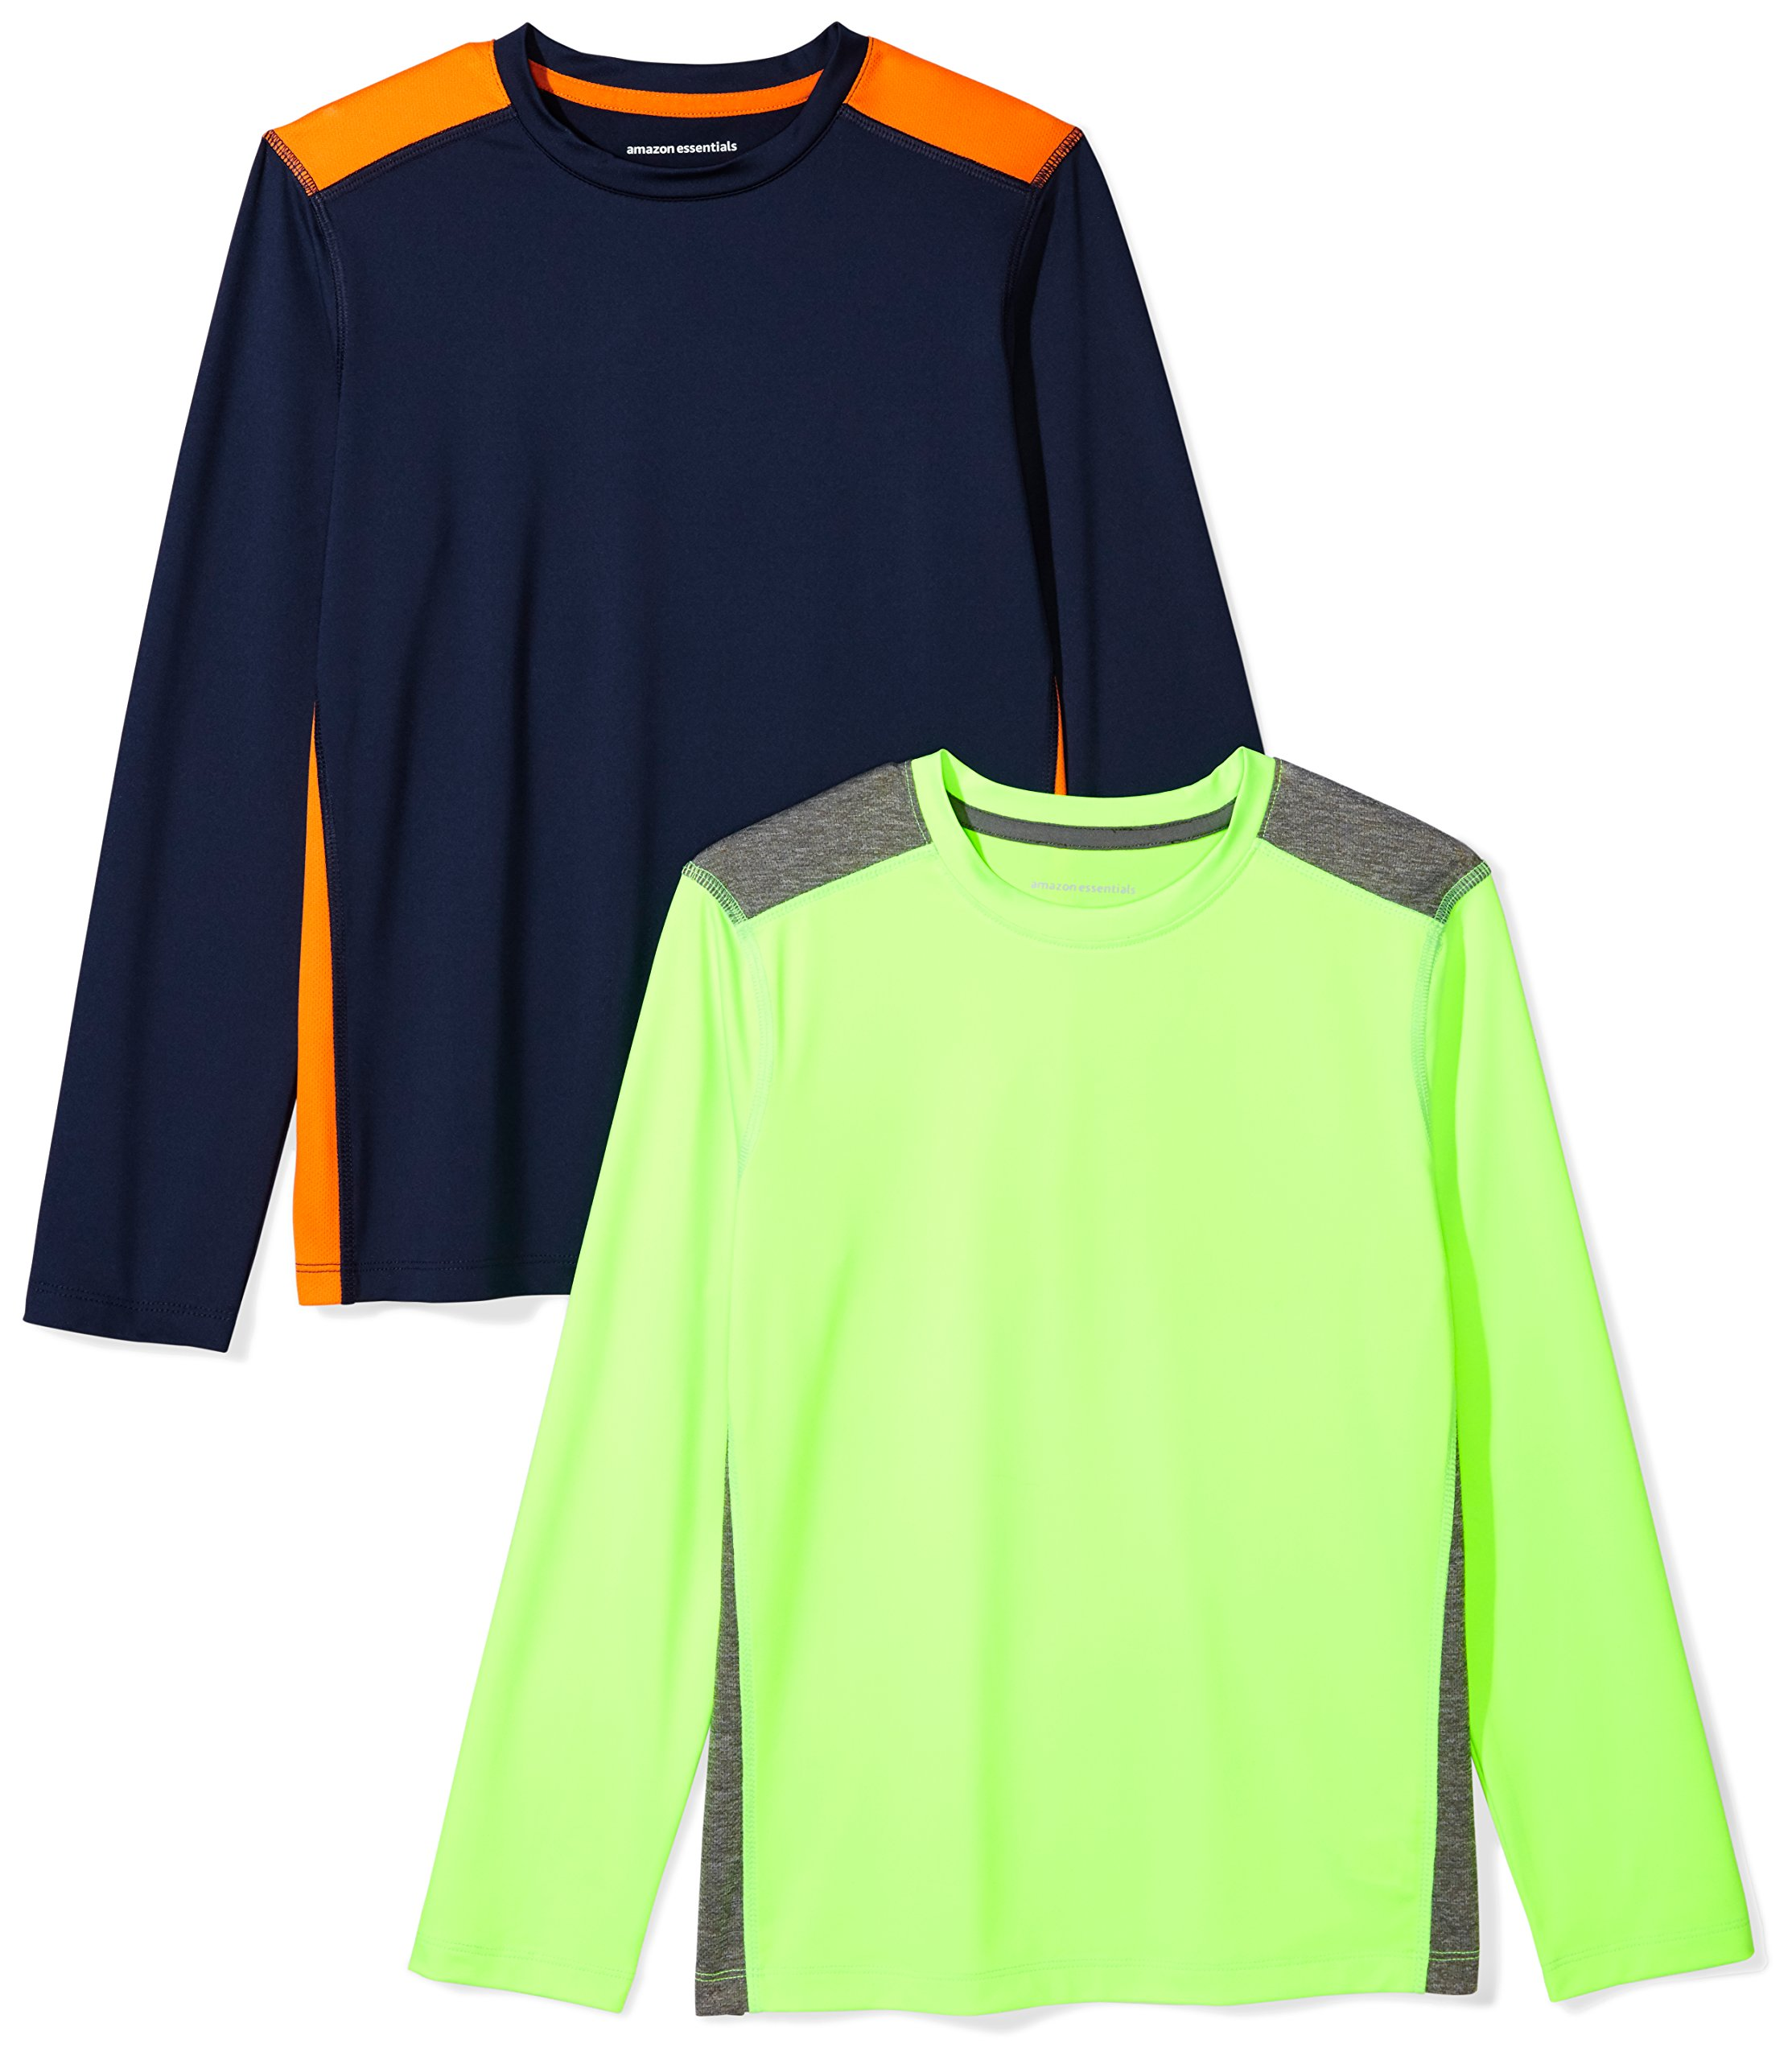 Amazon Essentials Boys' 2-Pack Long-Sleeve Pieced Active Tee, Green/Orange, M